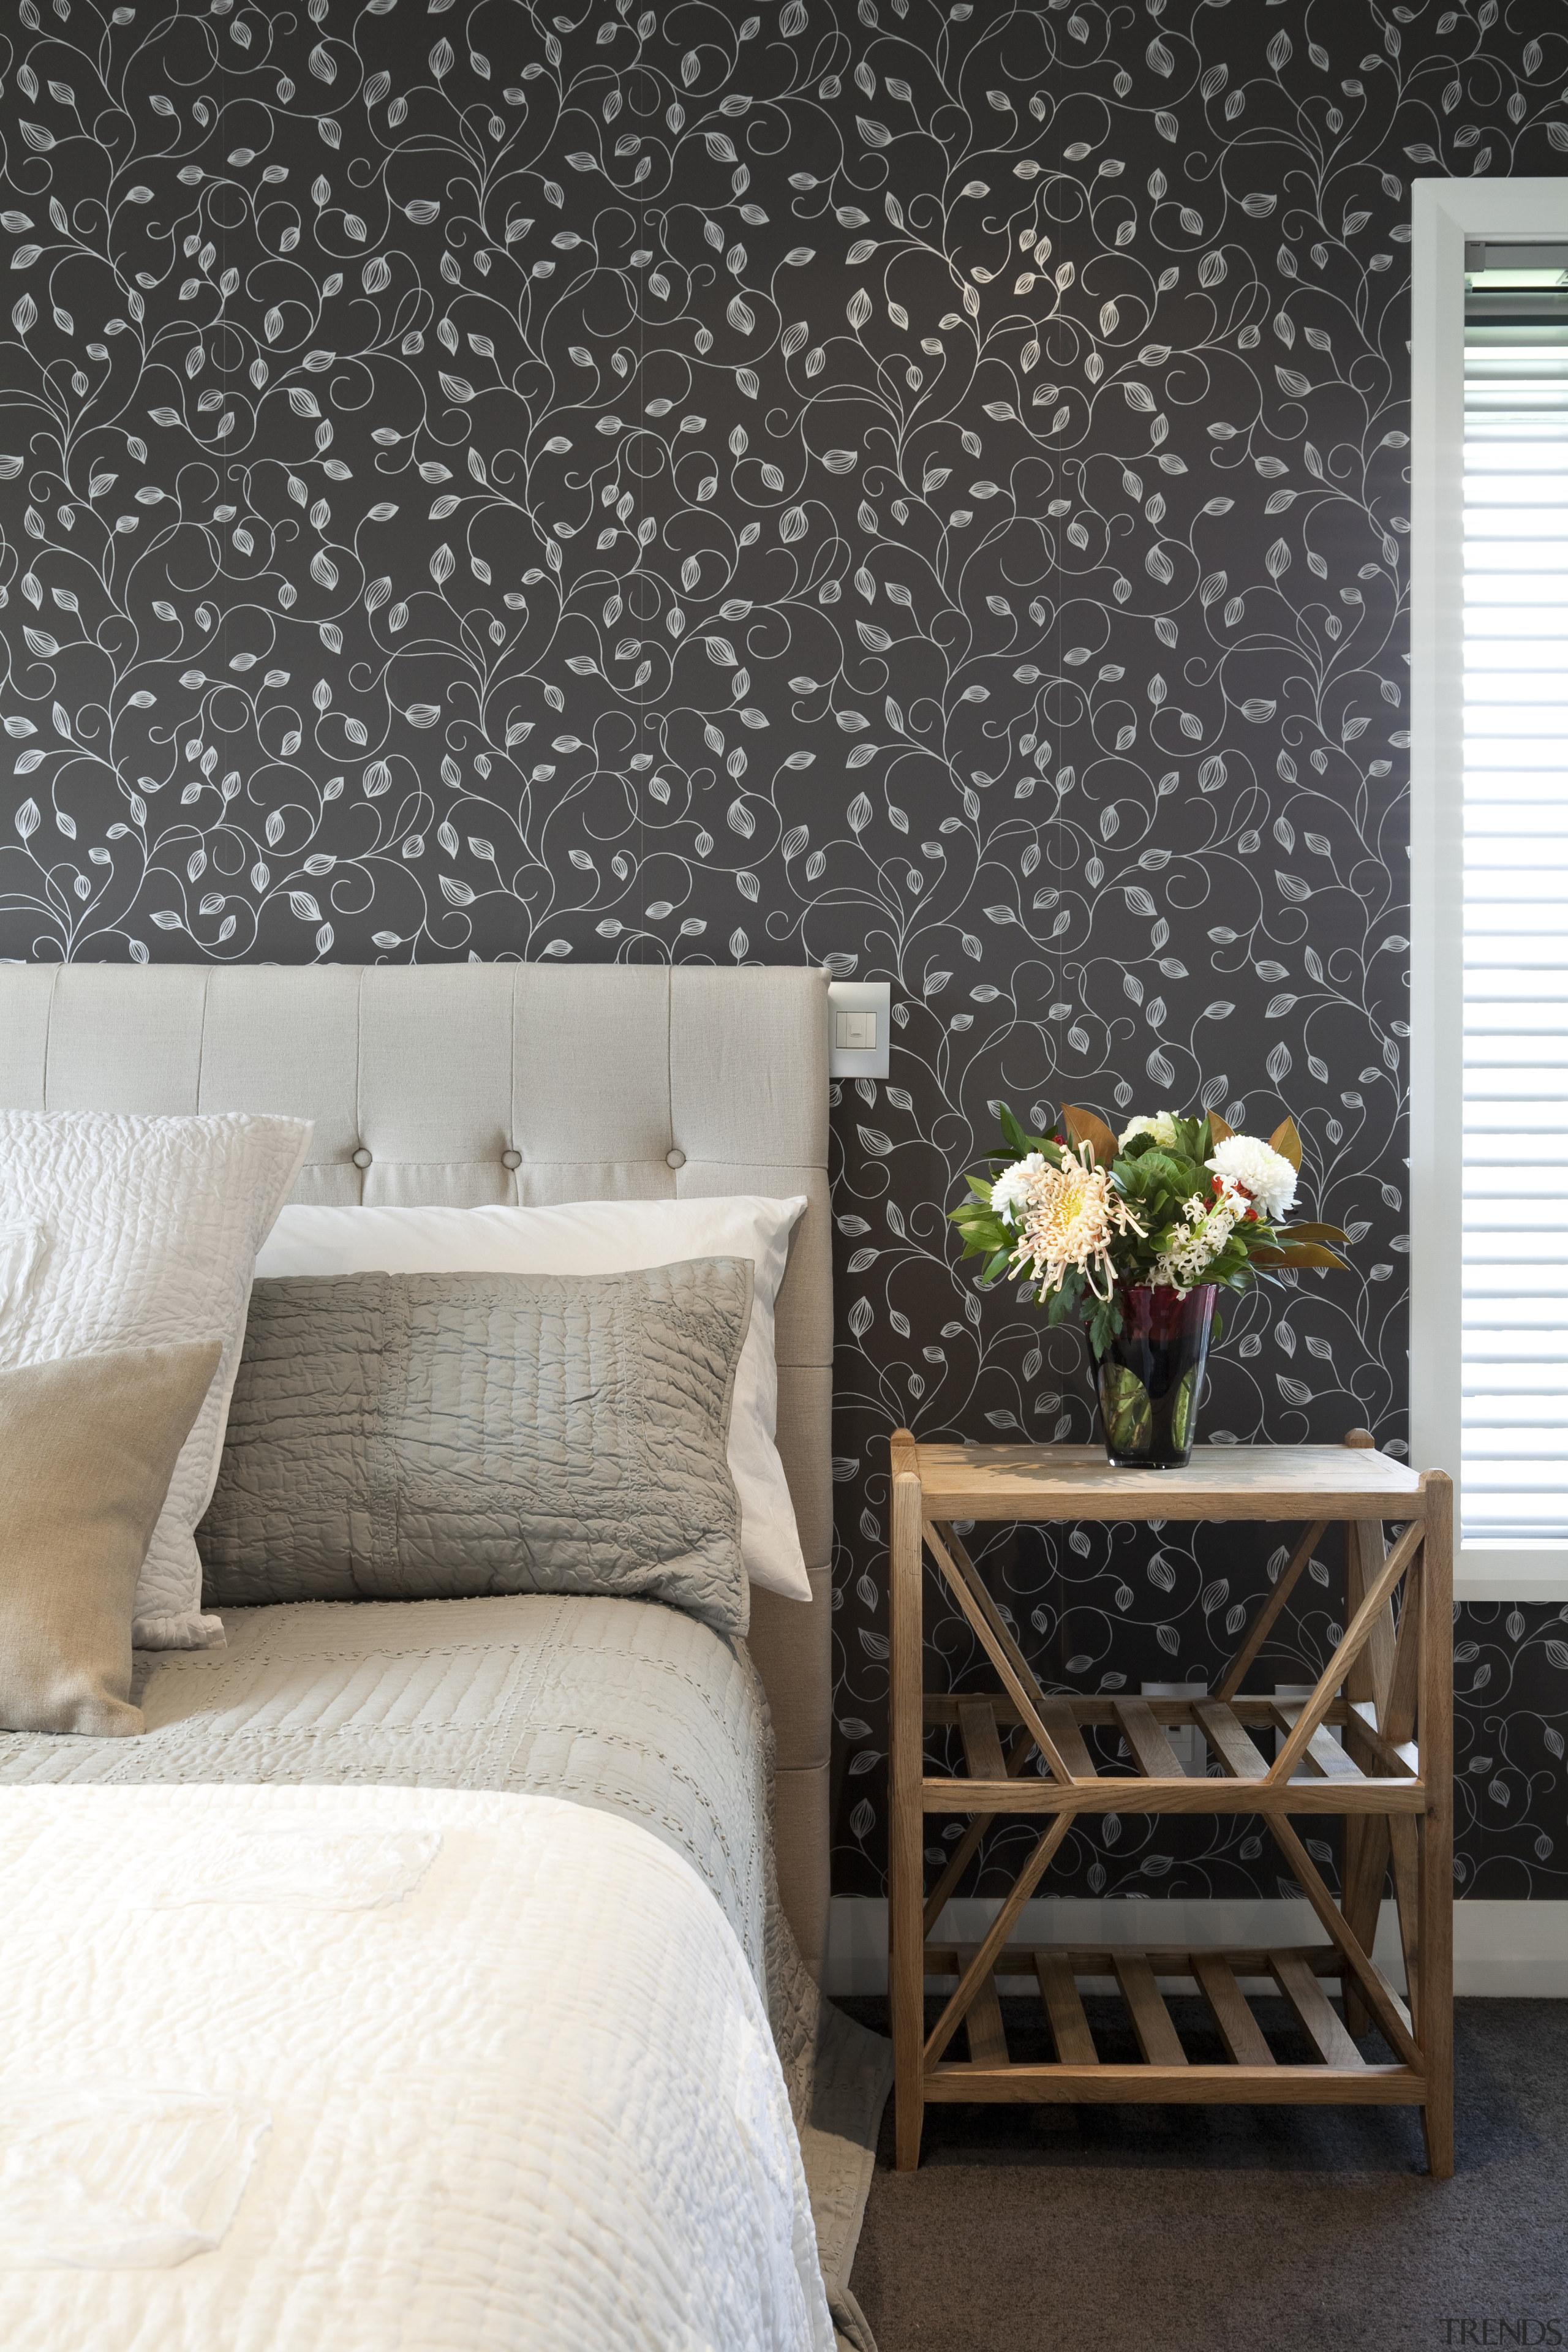 wallpaper in bedroom - wallpaper in bedroom - bed frame, bedroom, floor, furniture, home, interior design, living room, room, table, wall, wallpaper, black, white